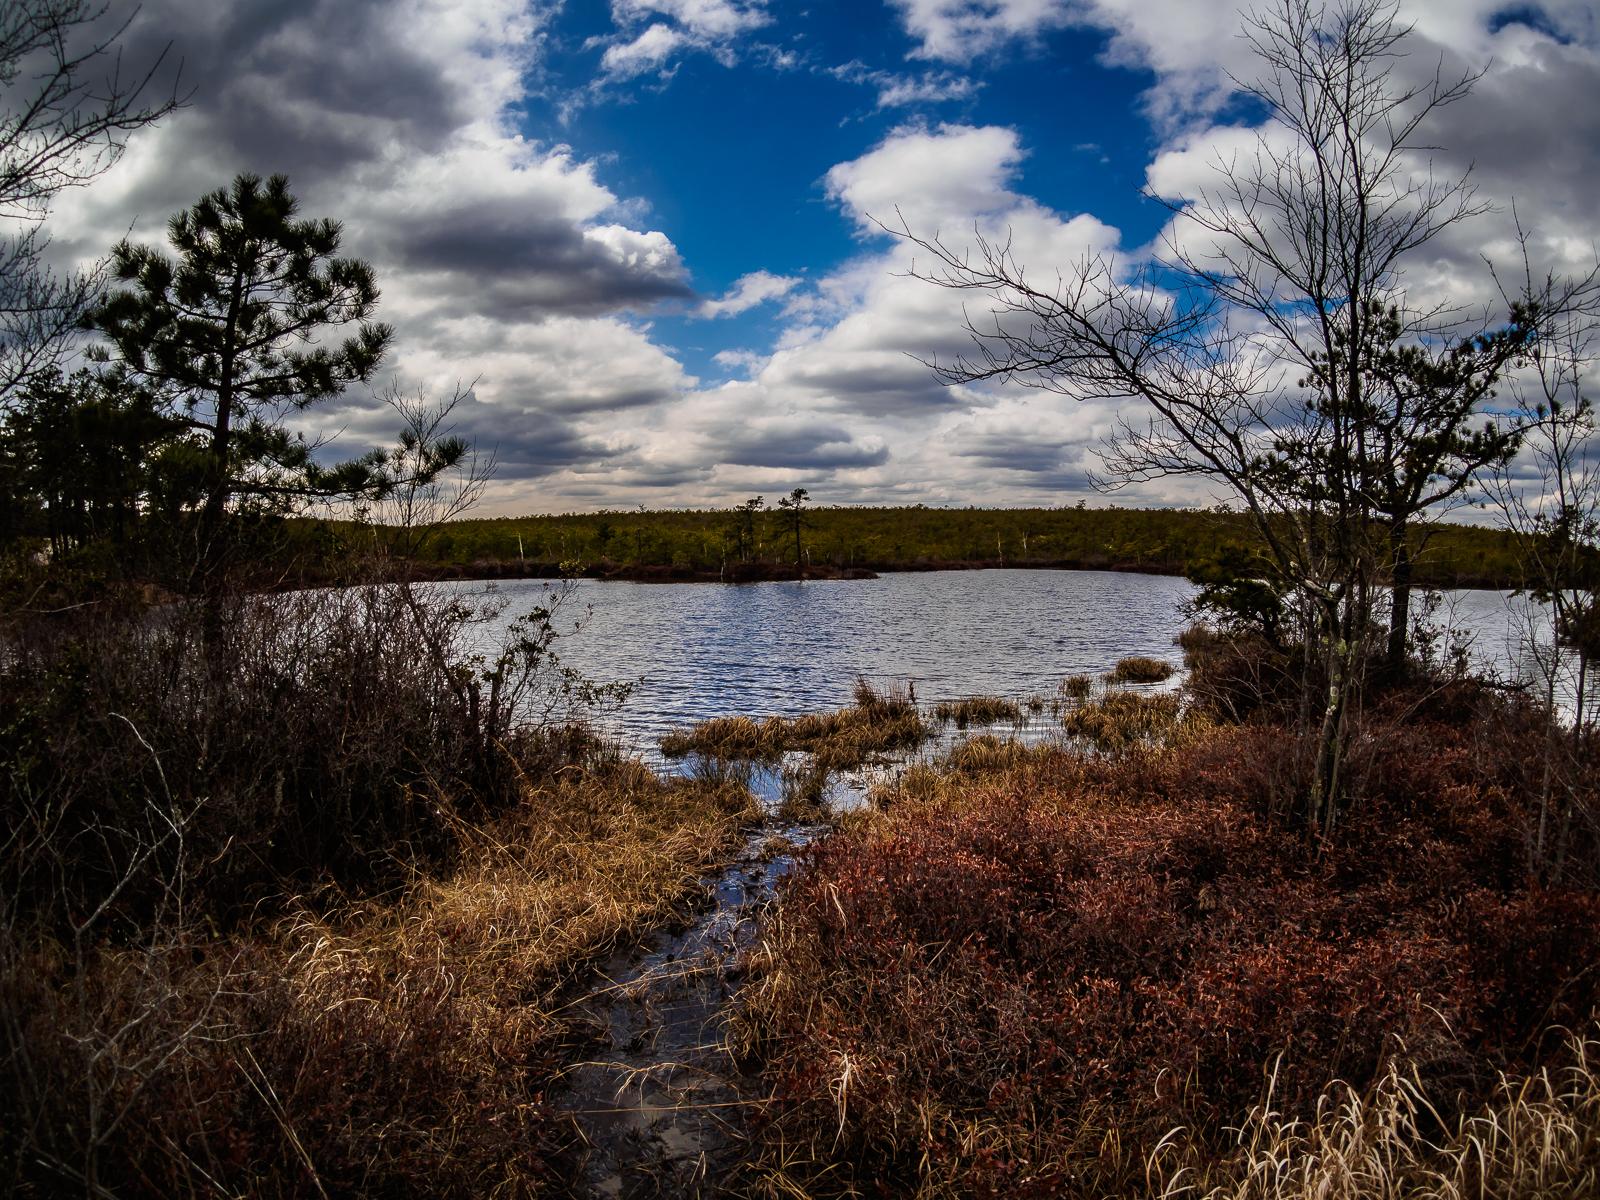 Pine lands Landscape photo at the warren-grove